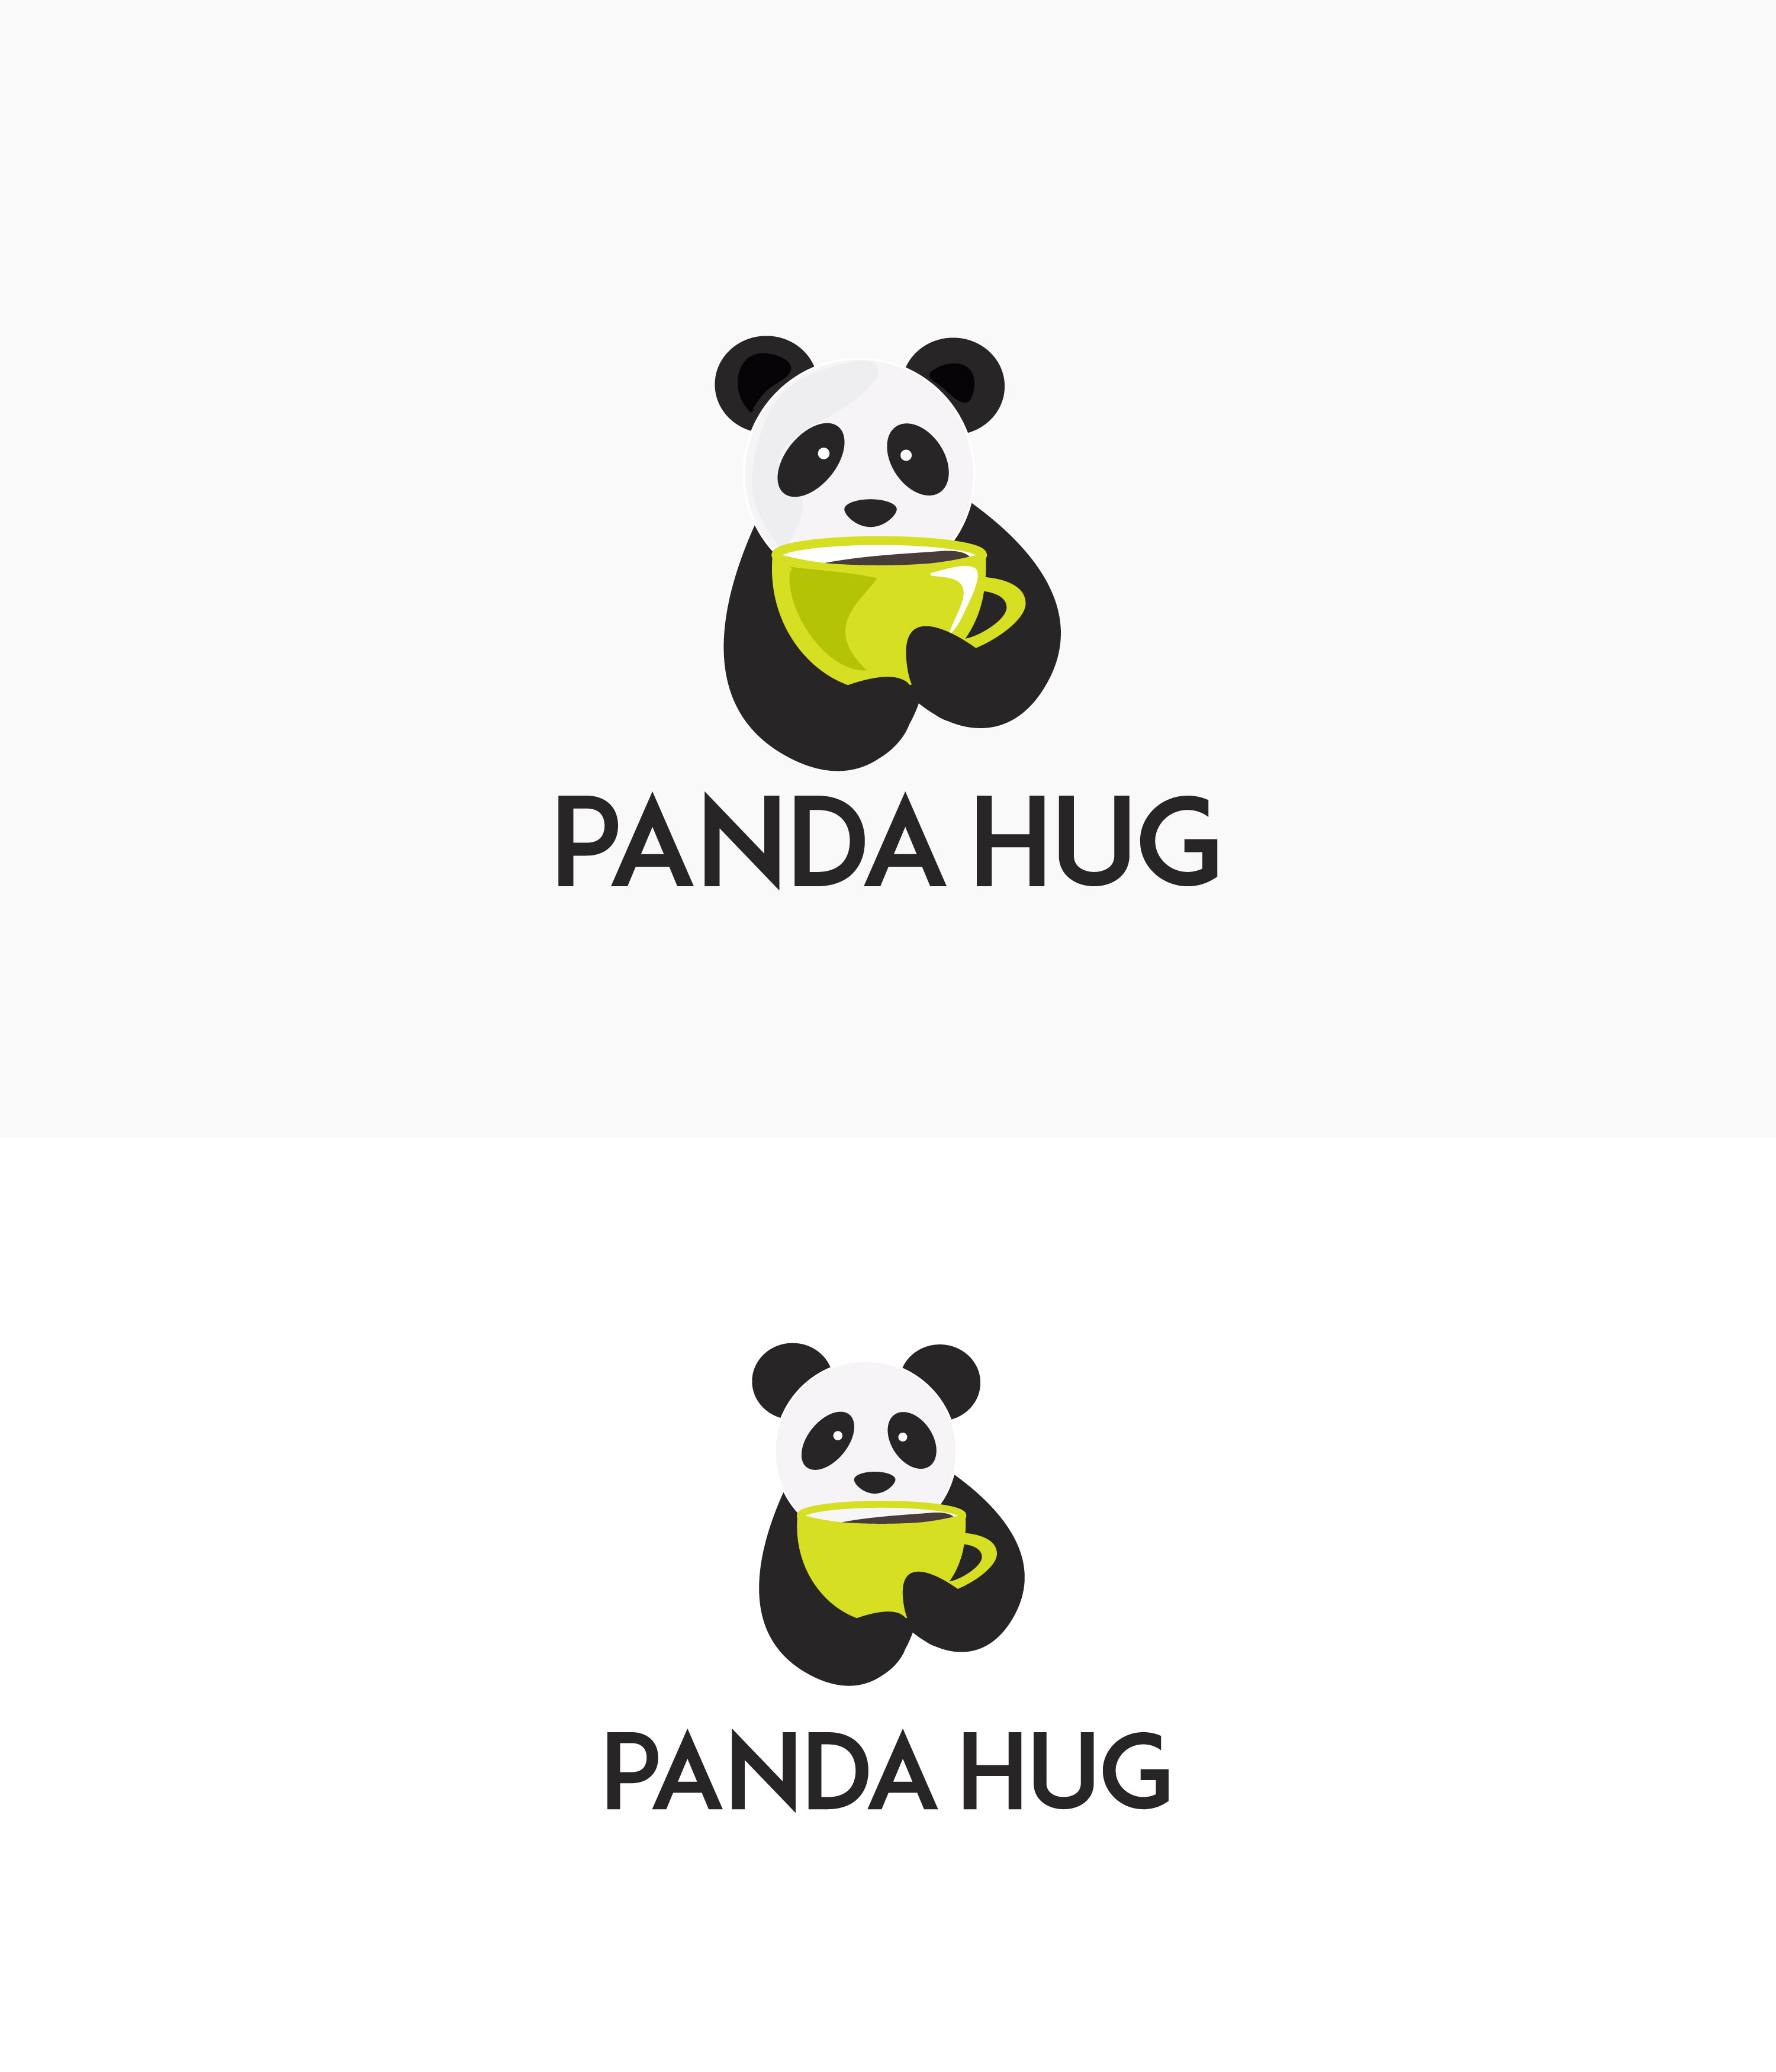 Modern Personable Logo Design For Panda Hug By Nalanrradu Design 23087221